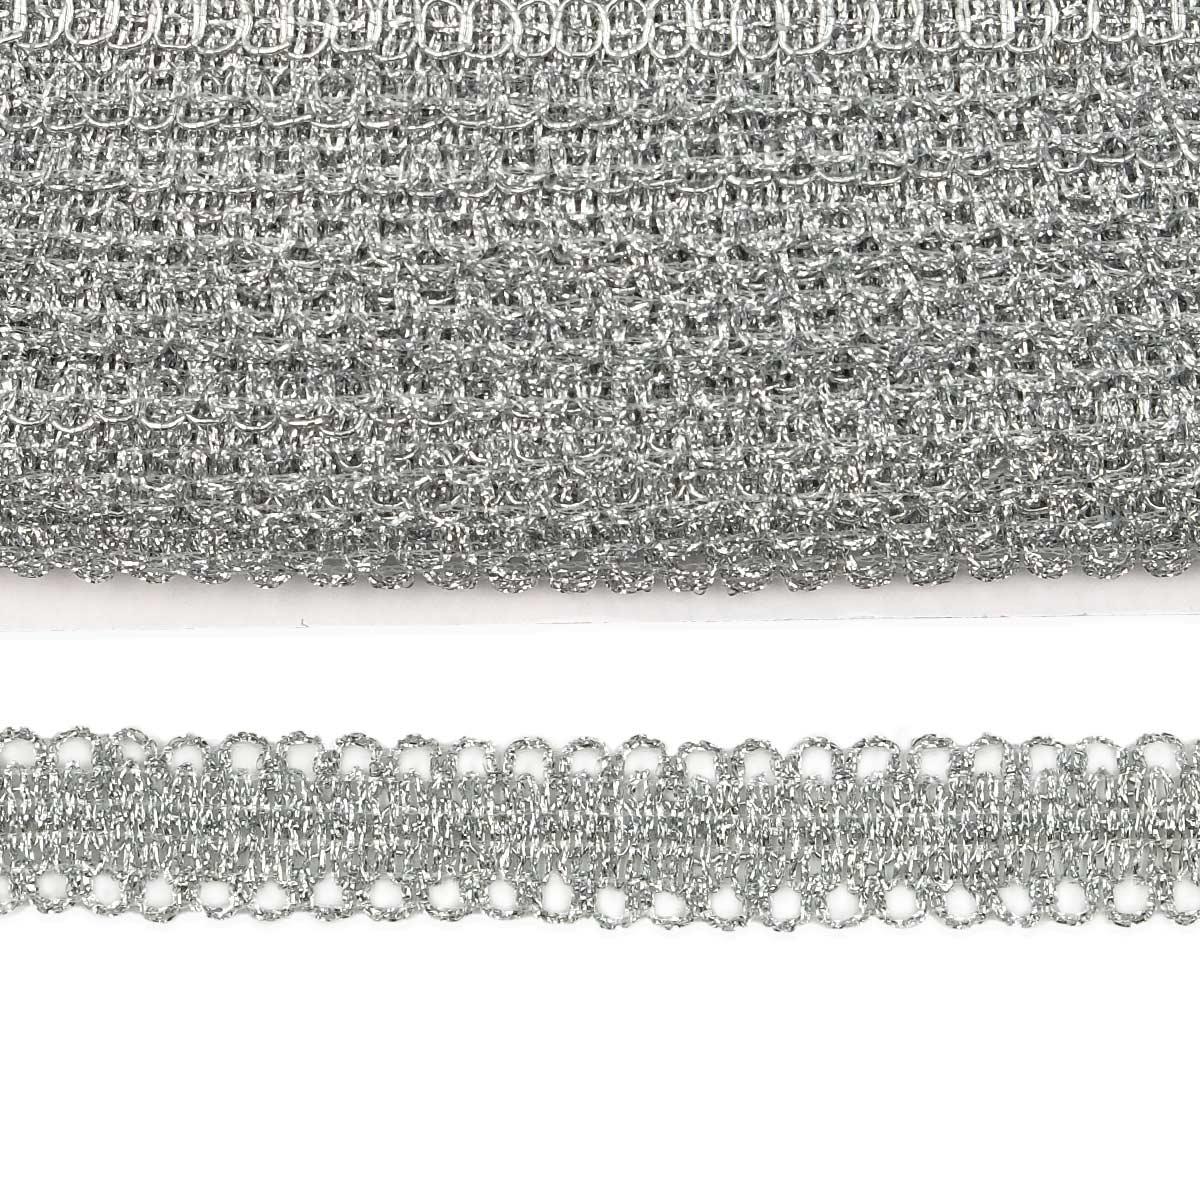 0384-1020 Тесьма металлизированная 20мм*18,29м (серебро) фото